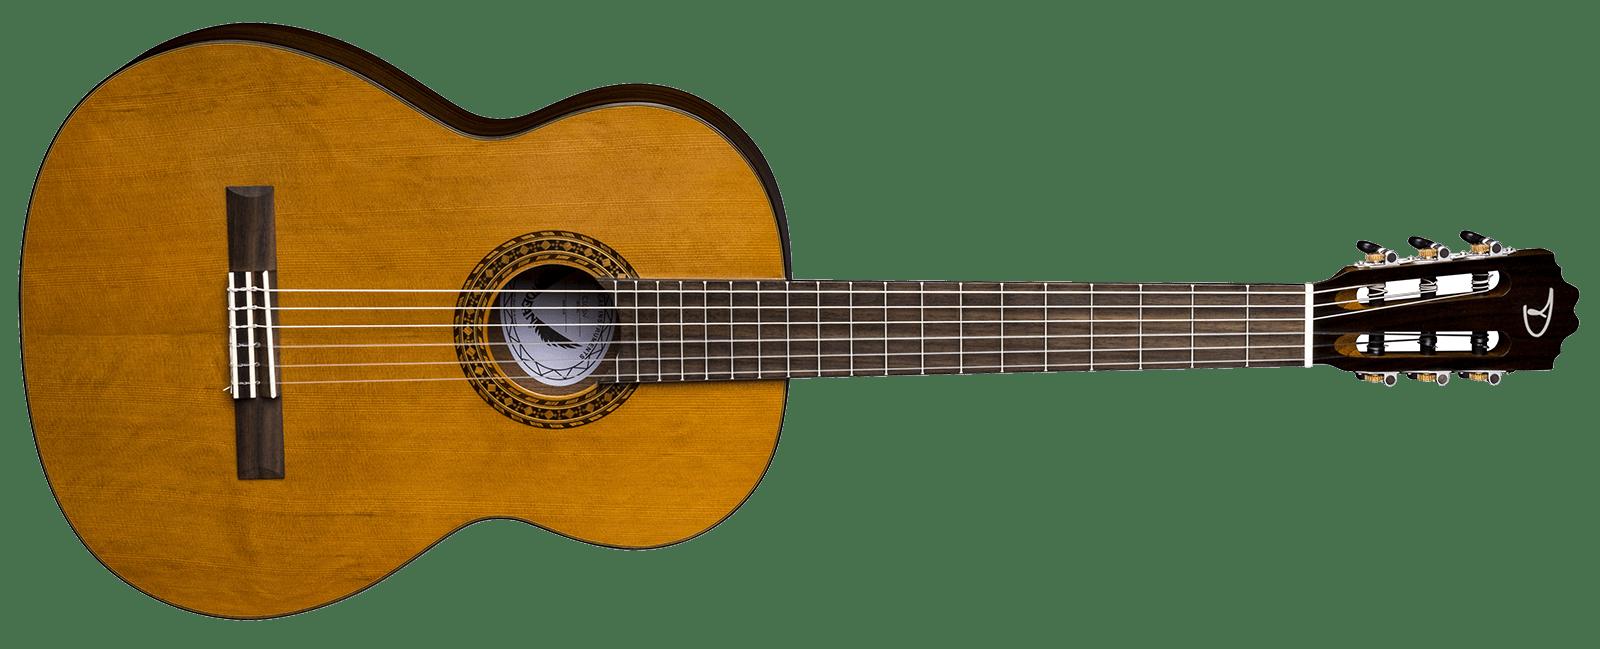 vector library Espana solid cedar sn. Acoustic clipart classical guitar